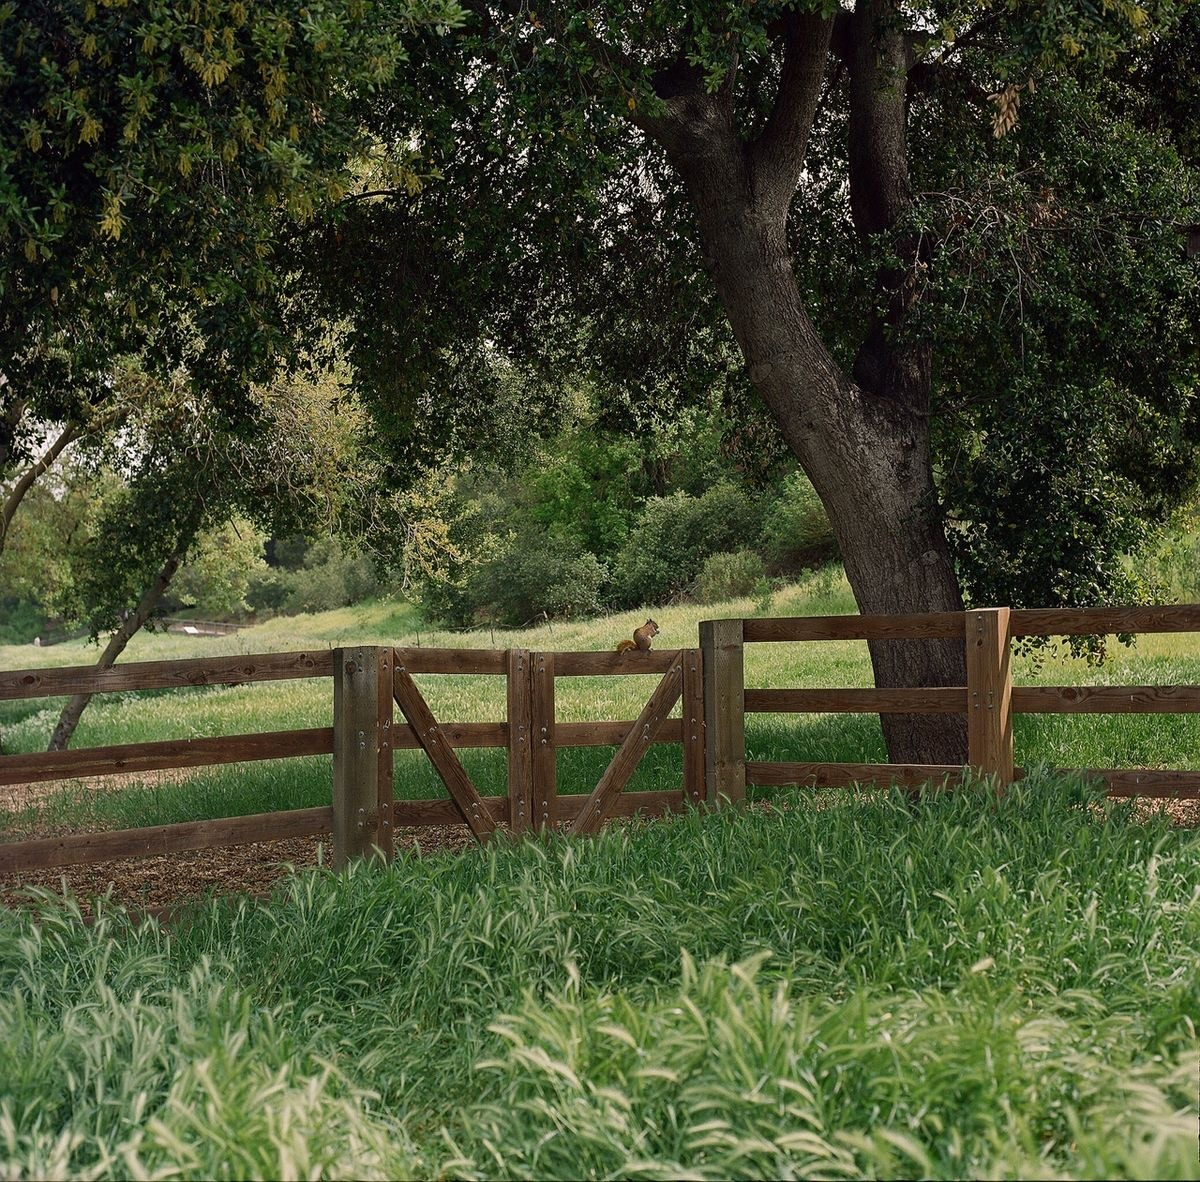 Photo by Branden Frederick #cottagecore#cozycore#farmcore#grandmacore#fairycore#naturecore#goblincore#springcore#summercore#cottage aesthetic#farm aesthetic #fairy tale aesthetic #nature#cottage witch#grandma aesthetic#spring